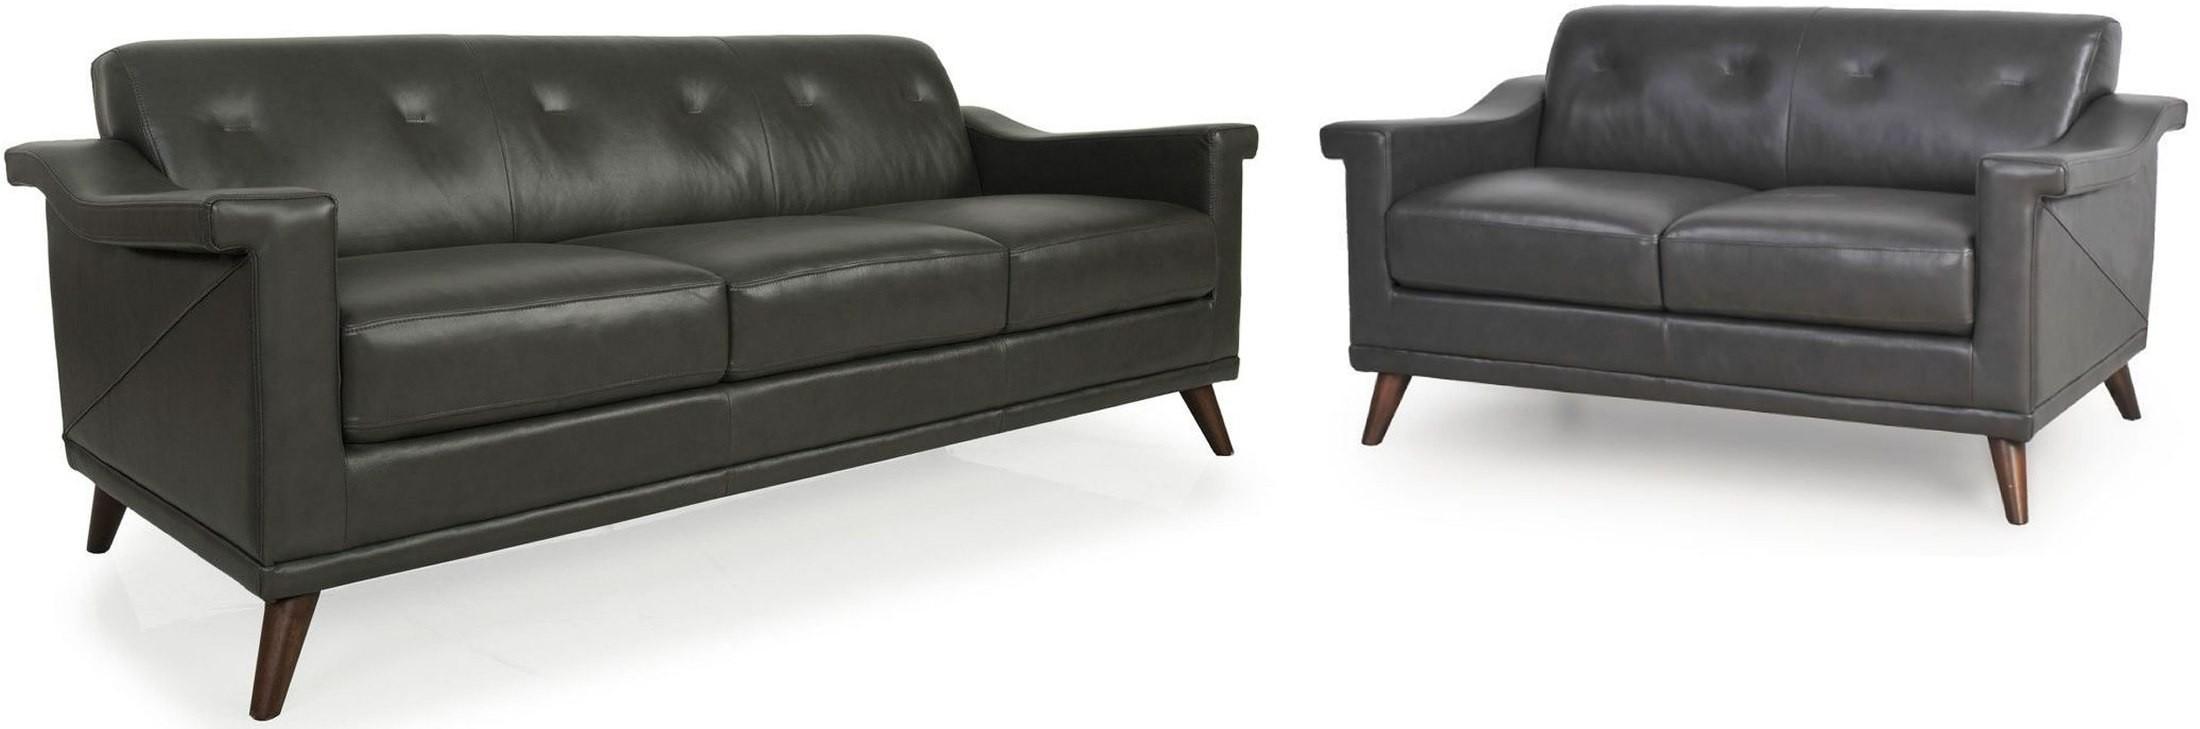 Kak Charcoal Grey Top Grain Leather Living Room Set 35603an S13301 Moroni